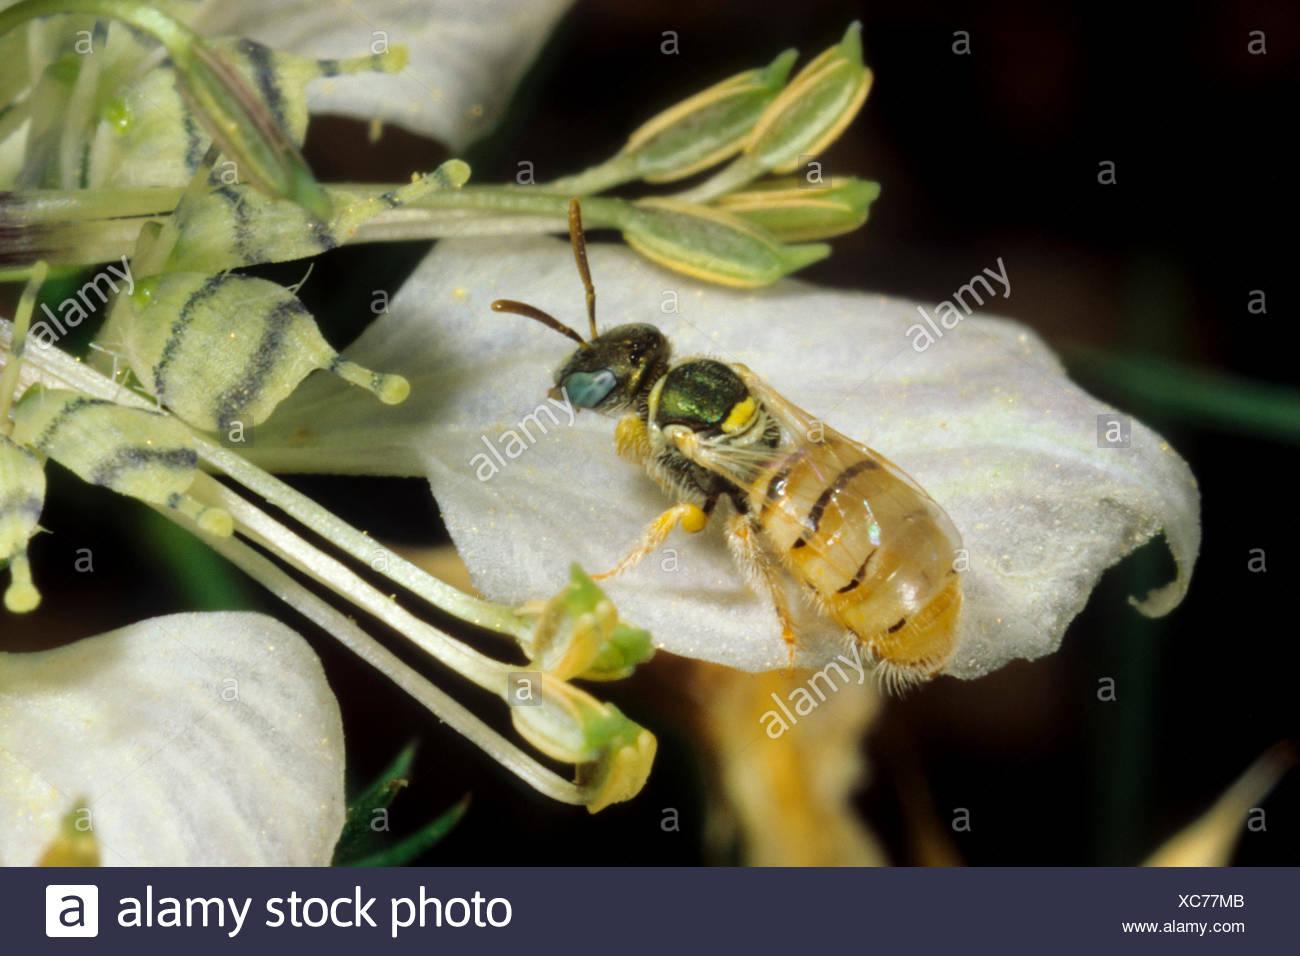 Sweat bee (Nomioides minutissima, Nomioides minutissimus), on Nigella arvensis, Germany Stock Photo